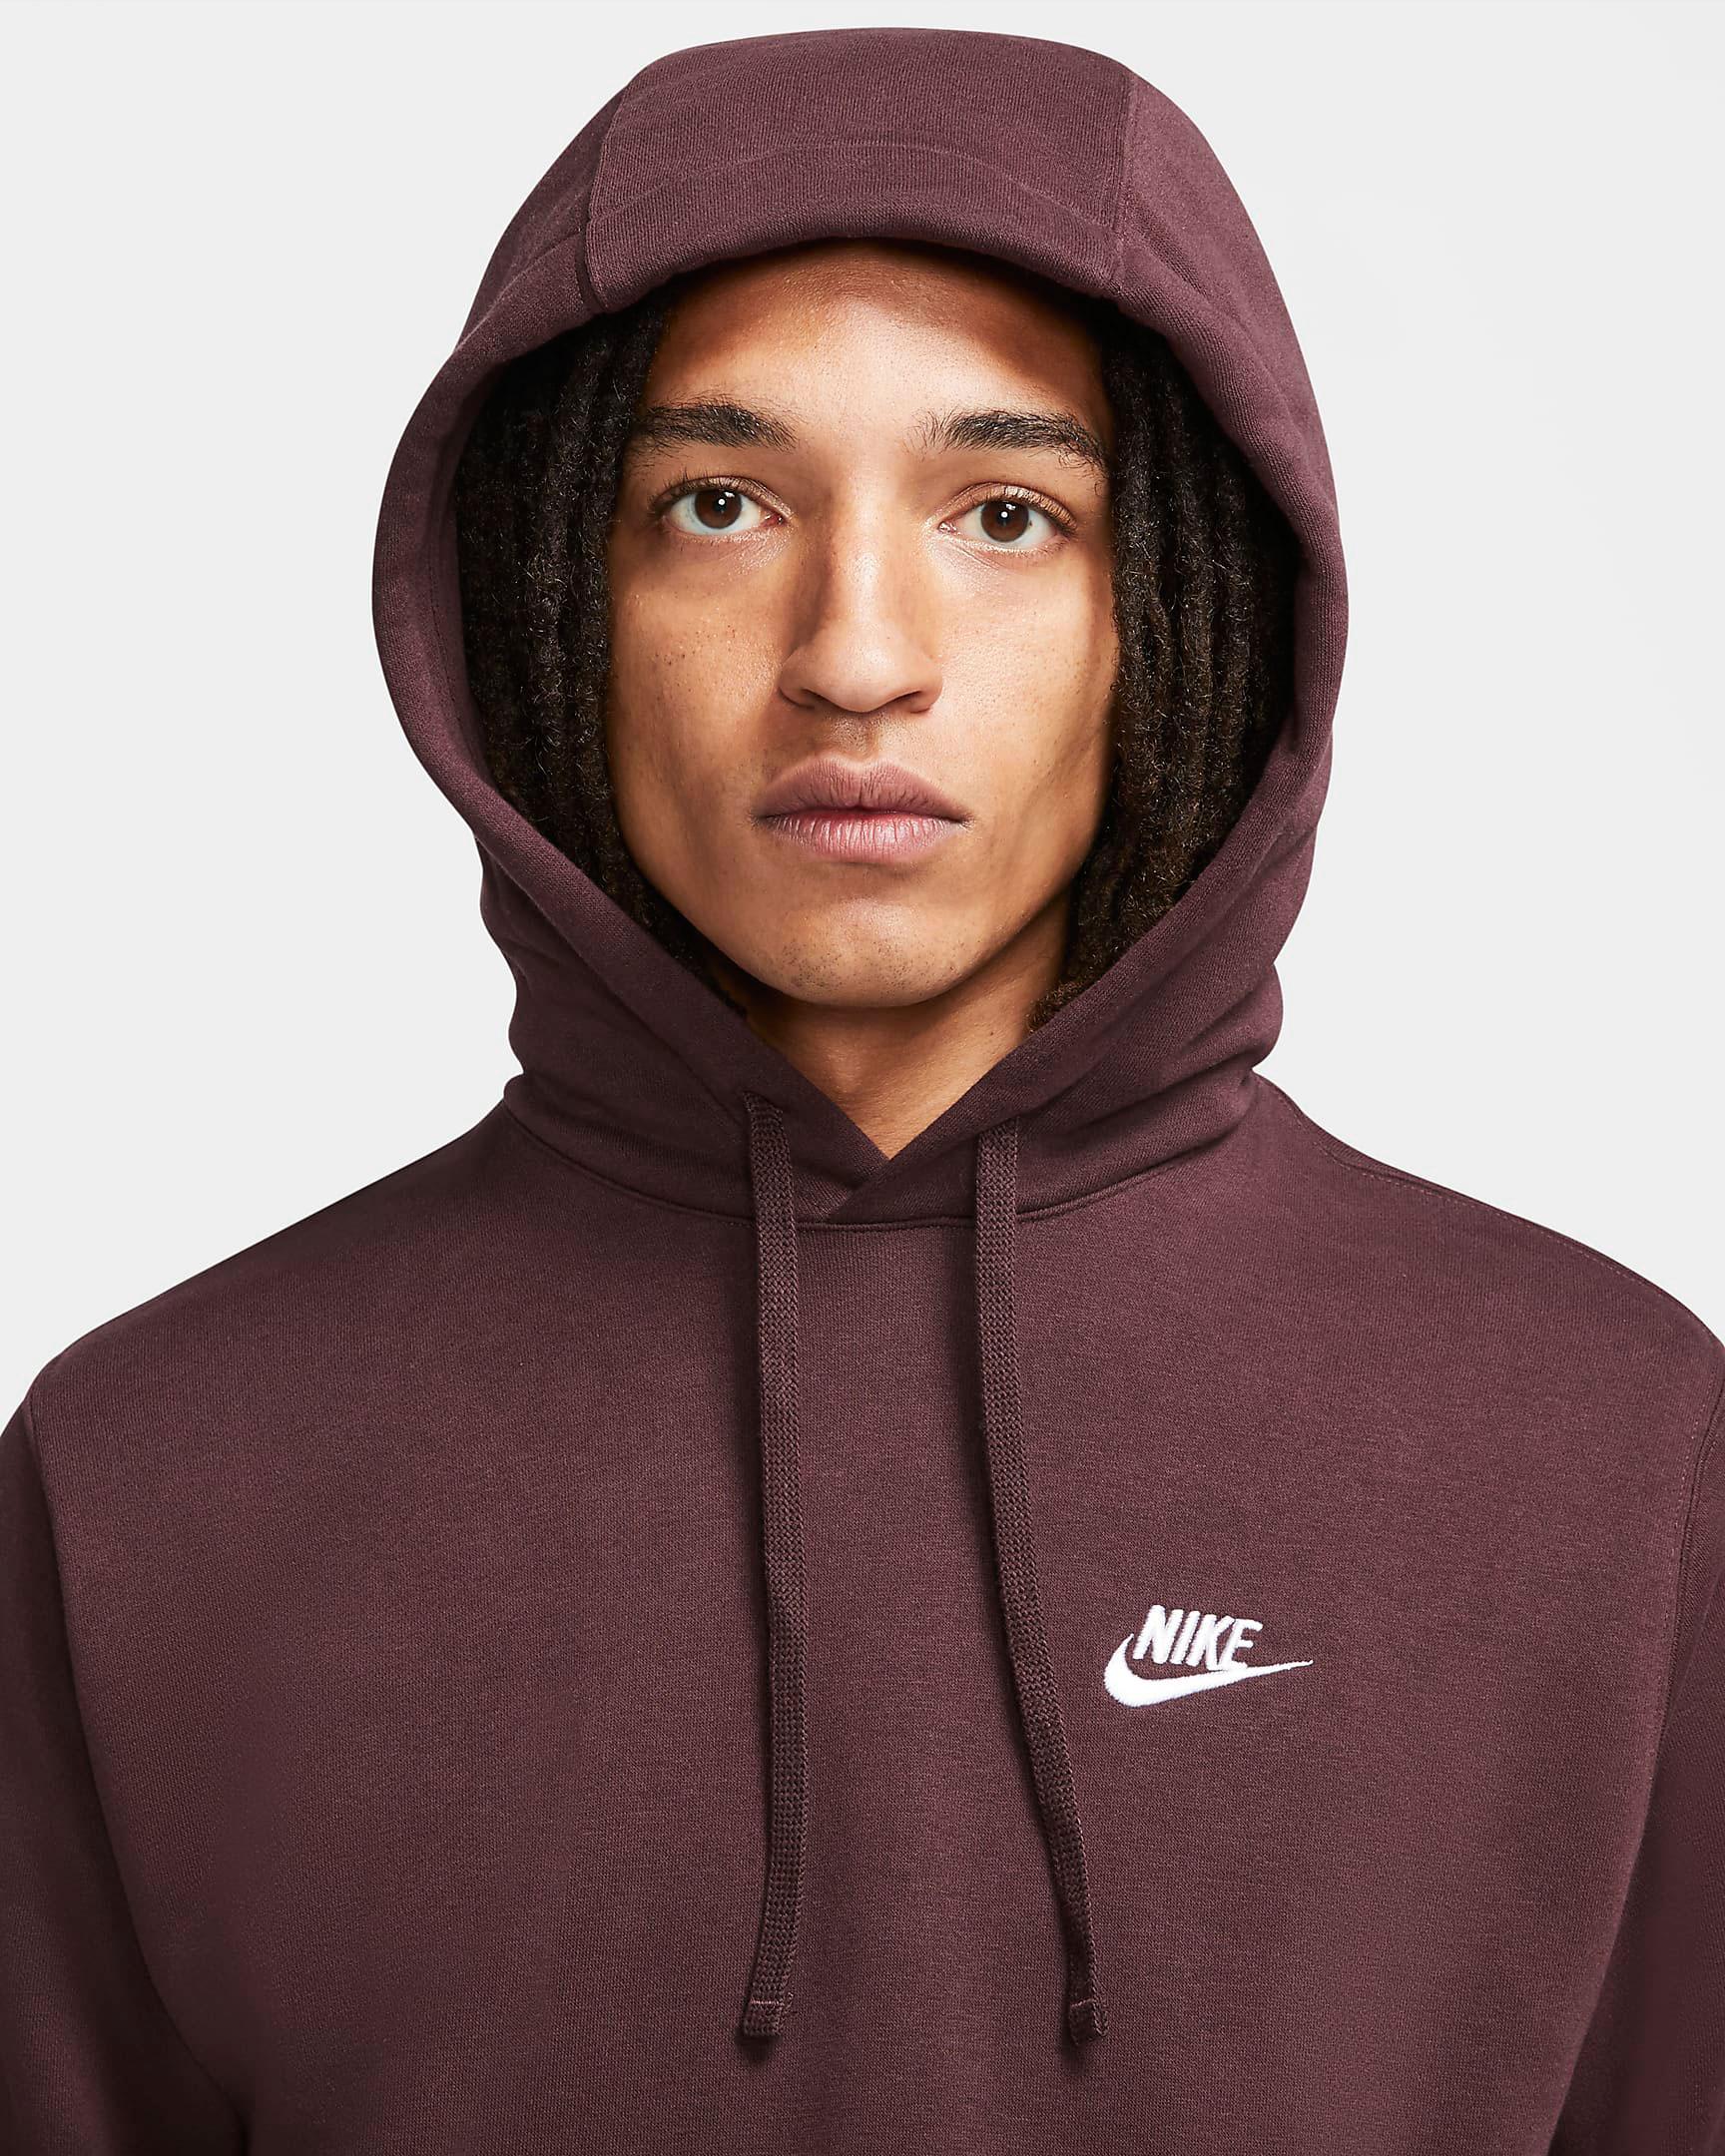 nike-club-fleece-hoodie-mahogany-brown-1